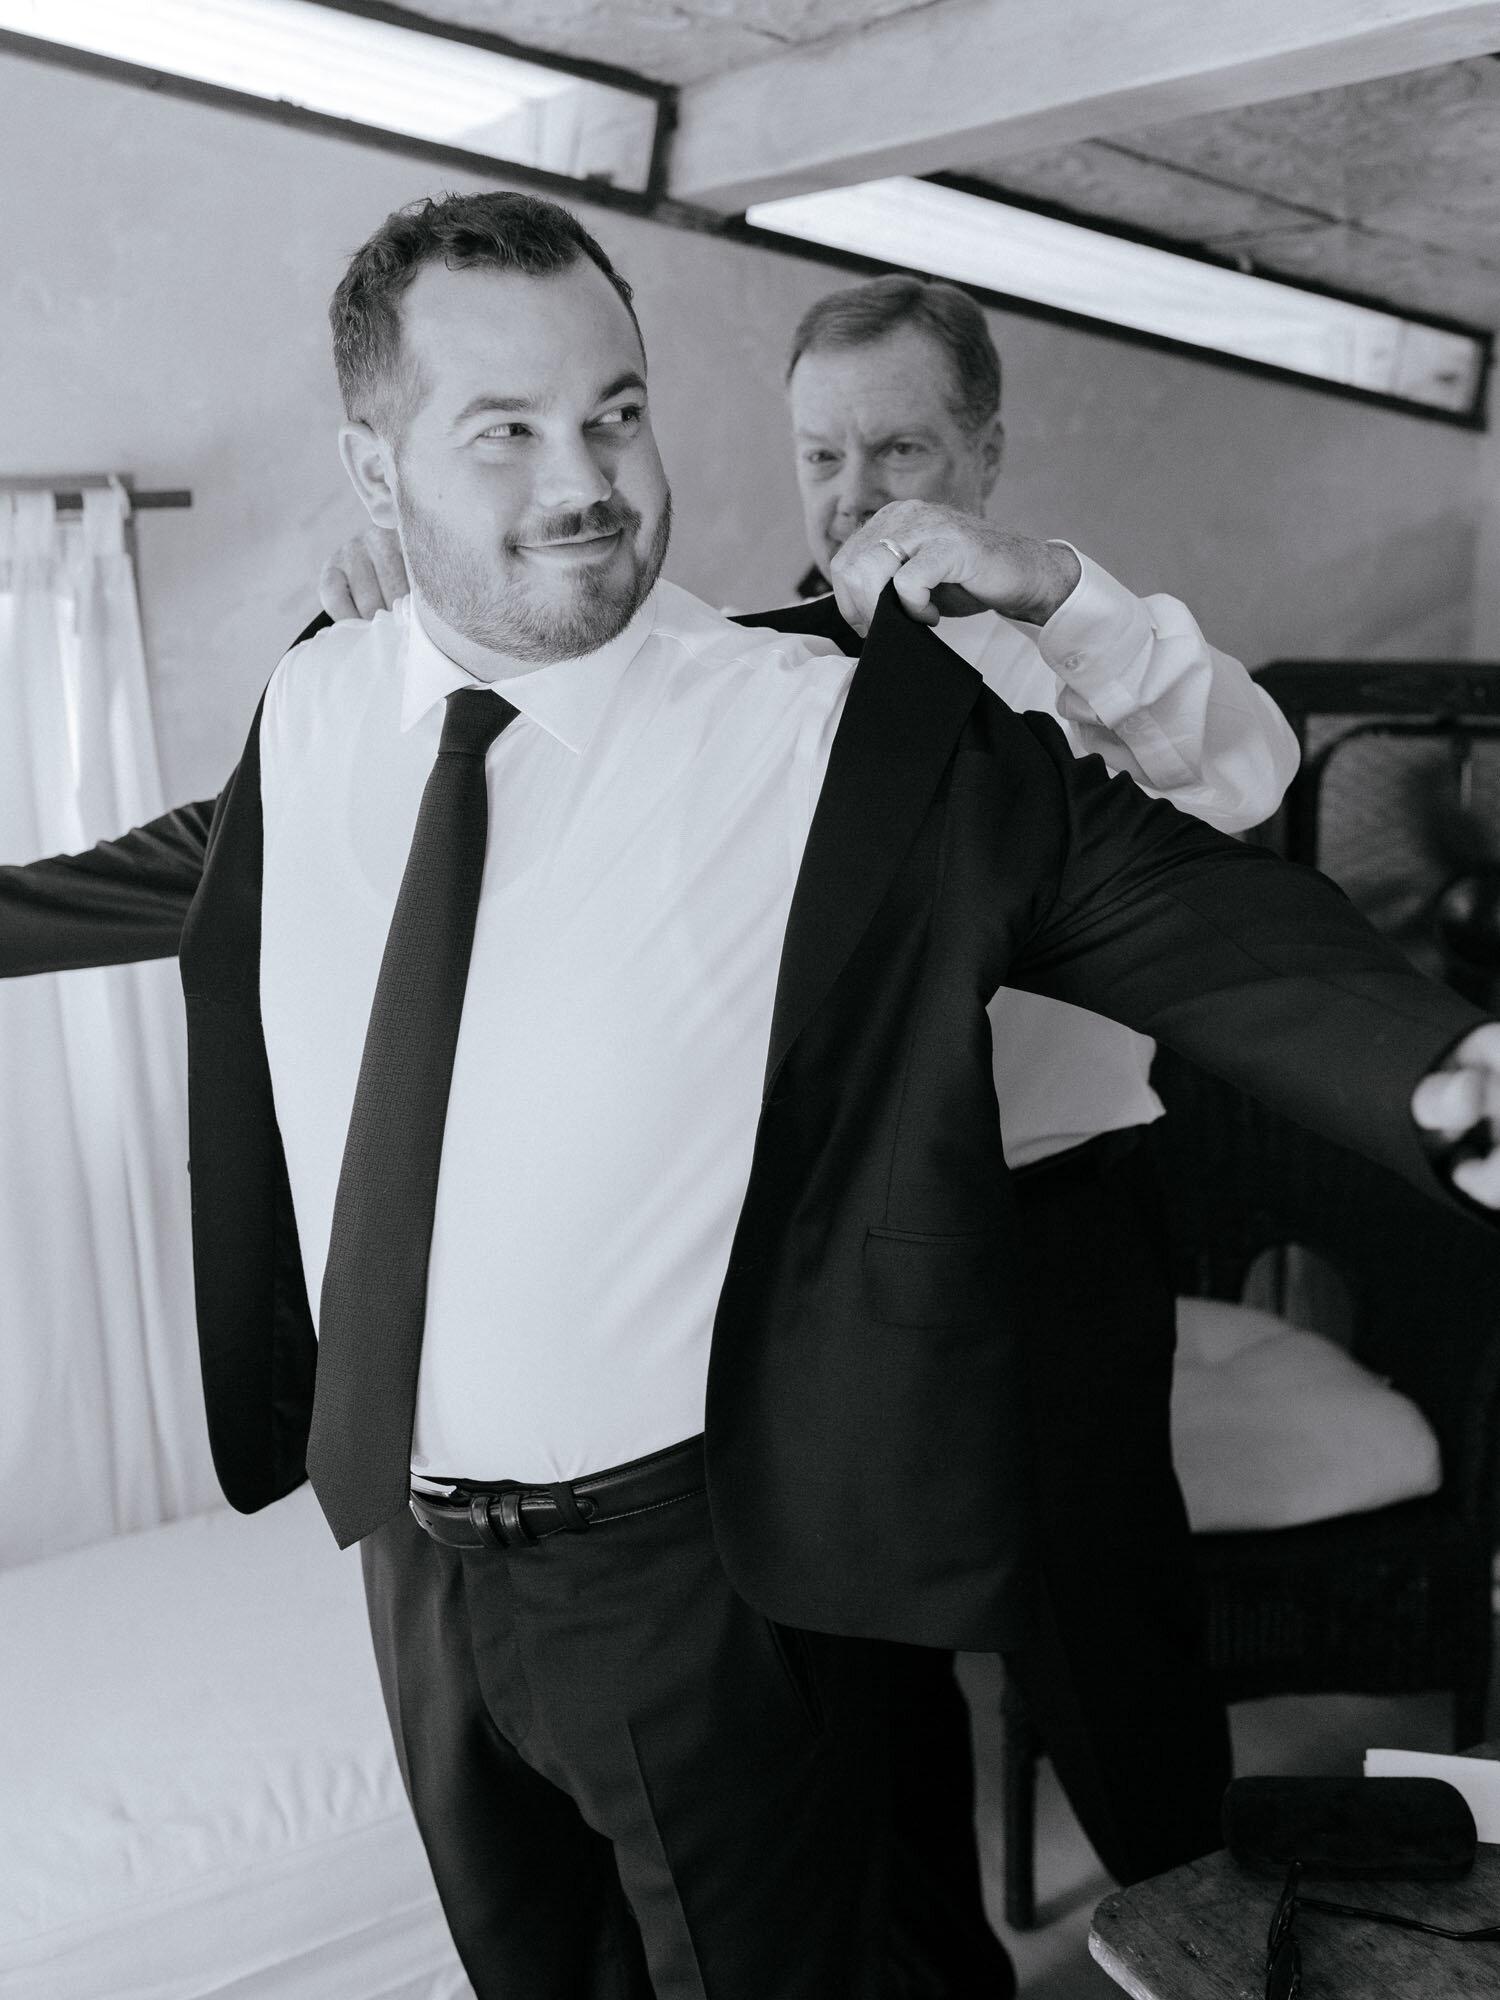 Chris-J-Evans-Maui-Wedding-Kim&Brian1707.jpg